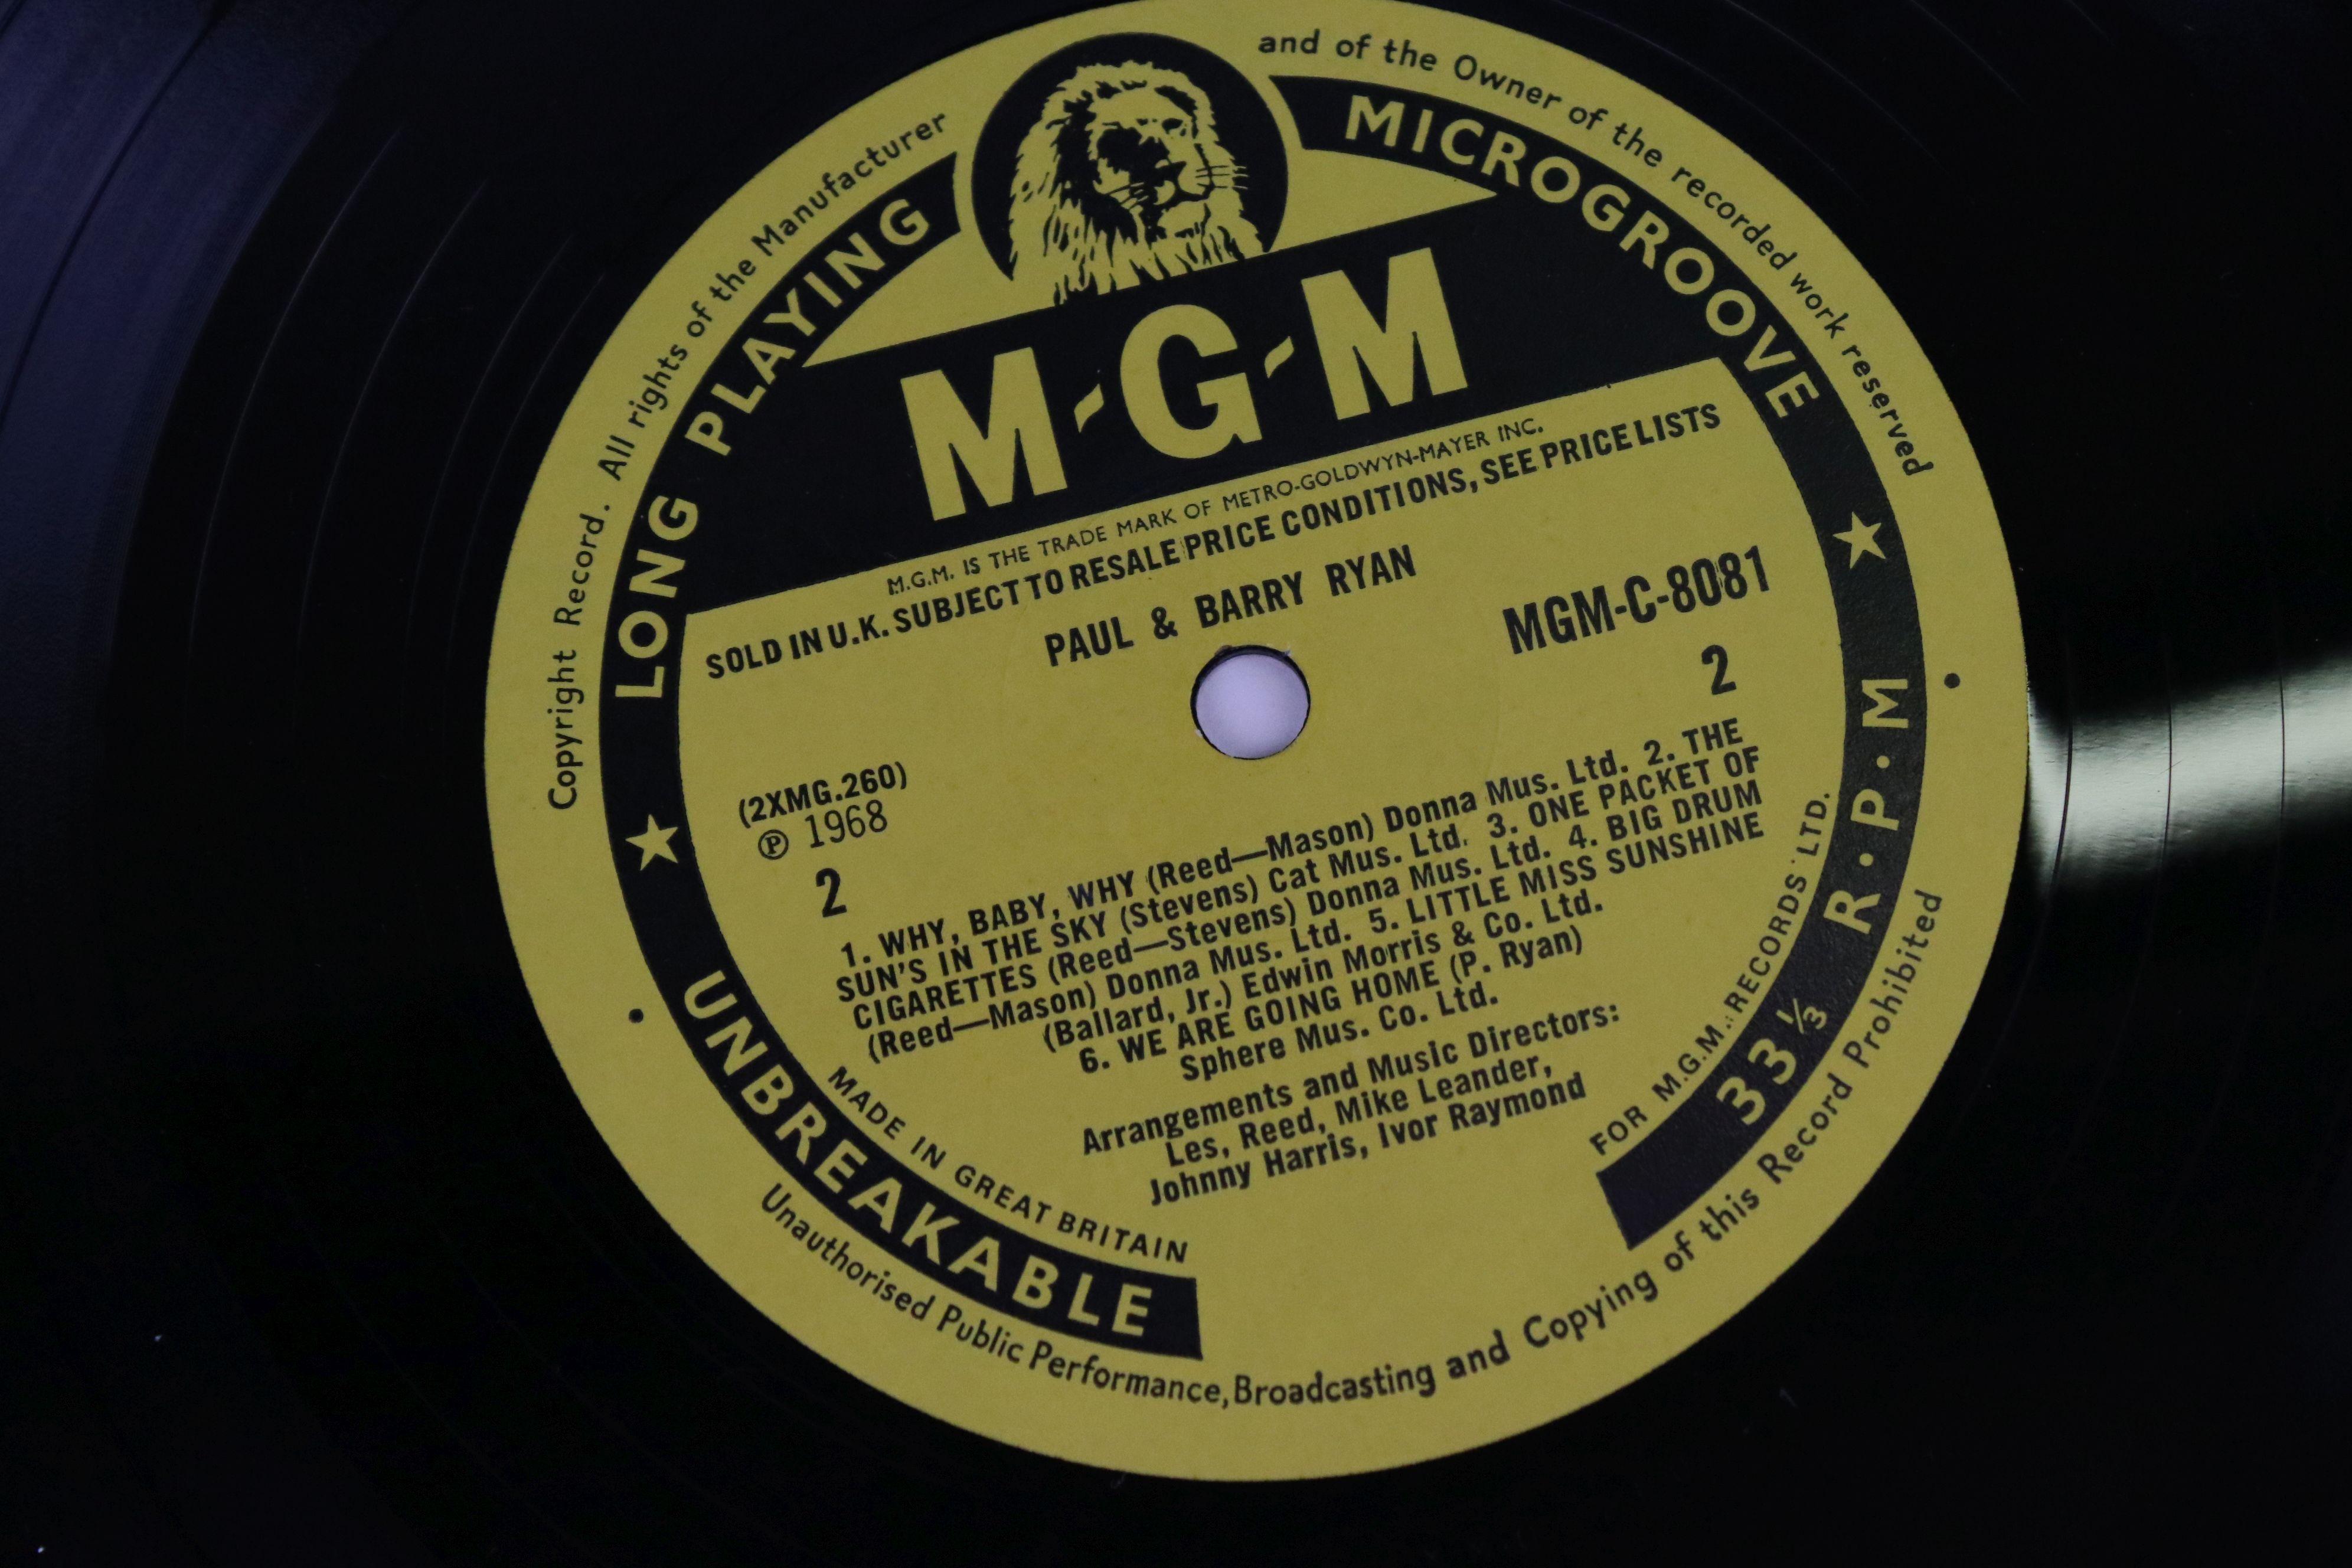 Vinyl - MOD/BEAT Paul & Barry Ryan self titled LP on MGM C 8081, mono non laminated, flip back - Image 4 of 5